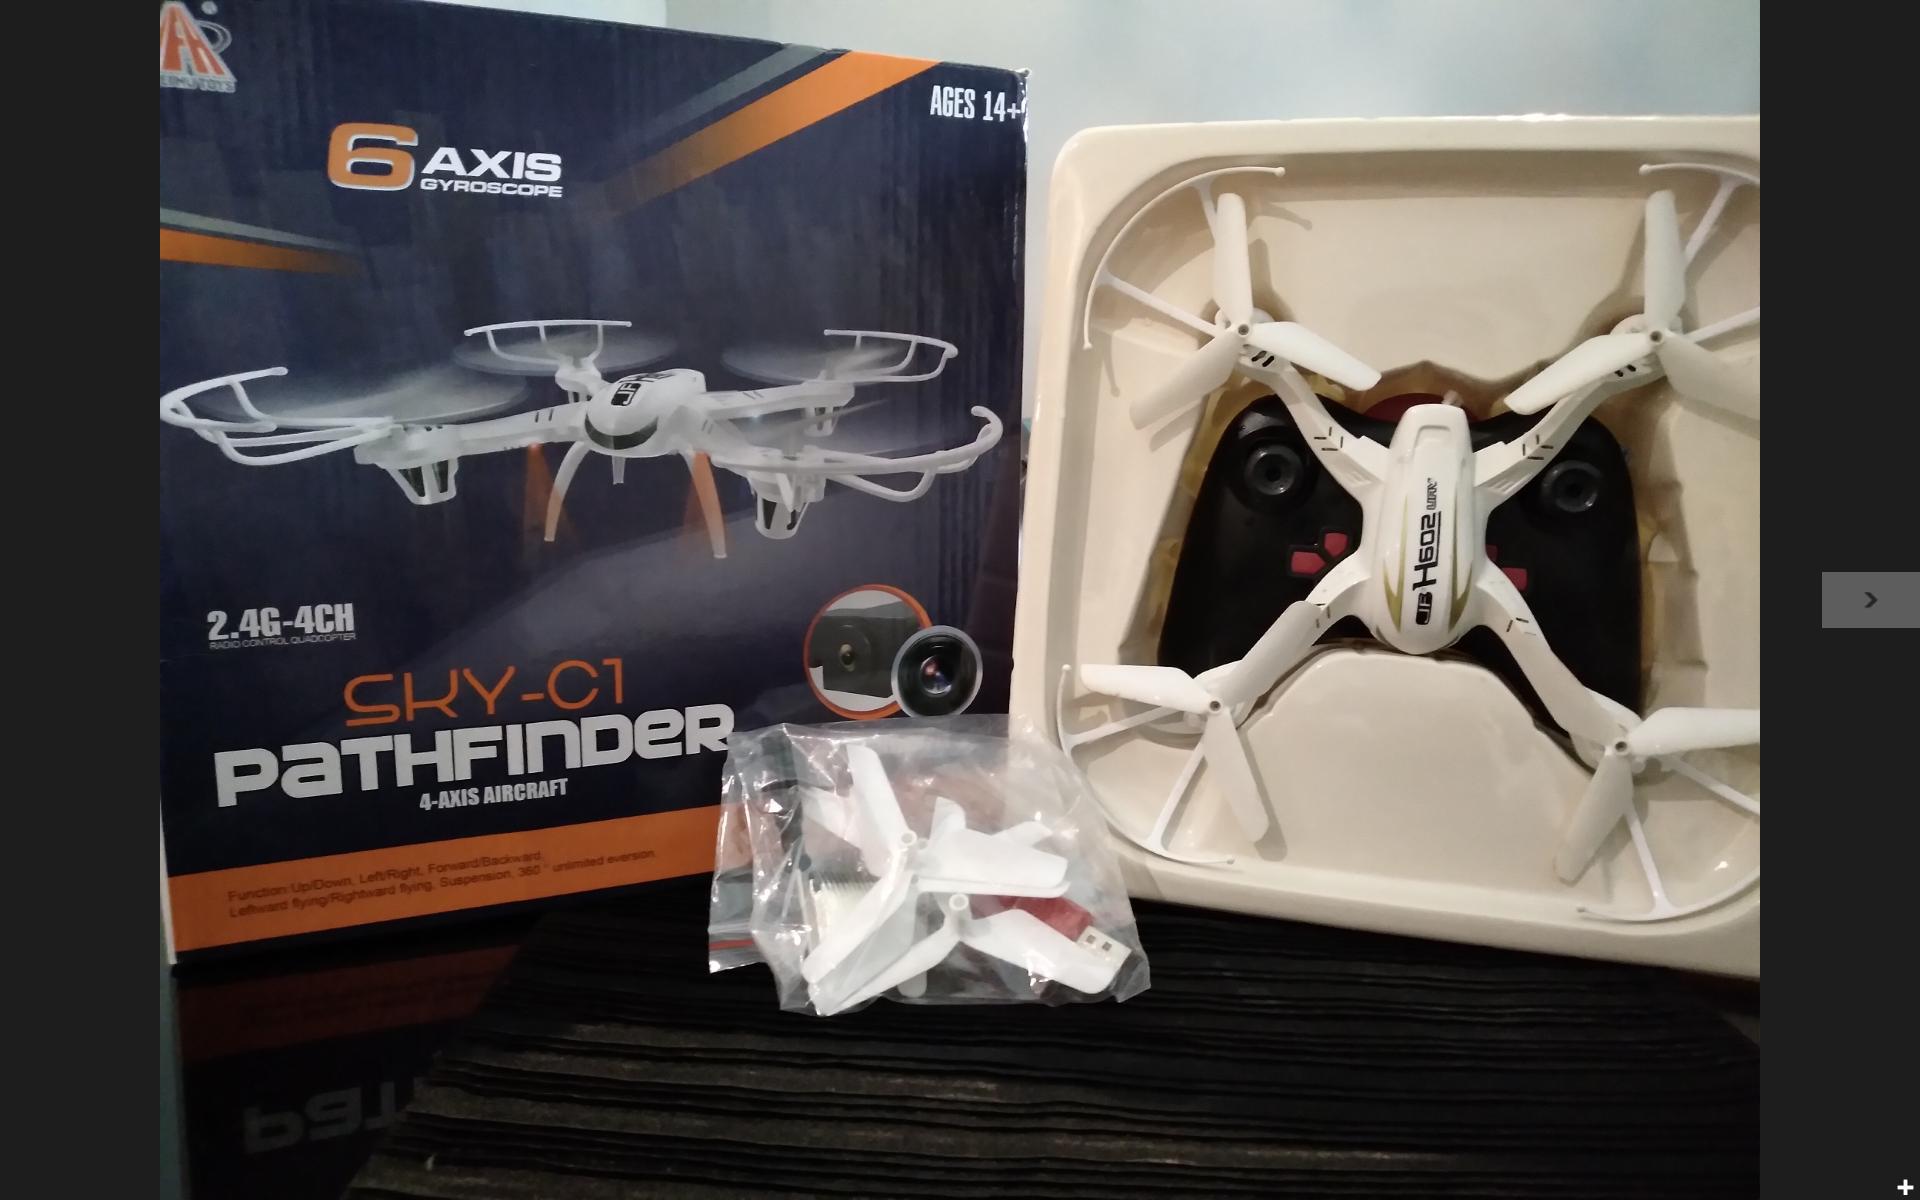 SKY-C1 Pathfinder